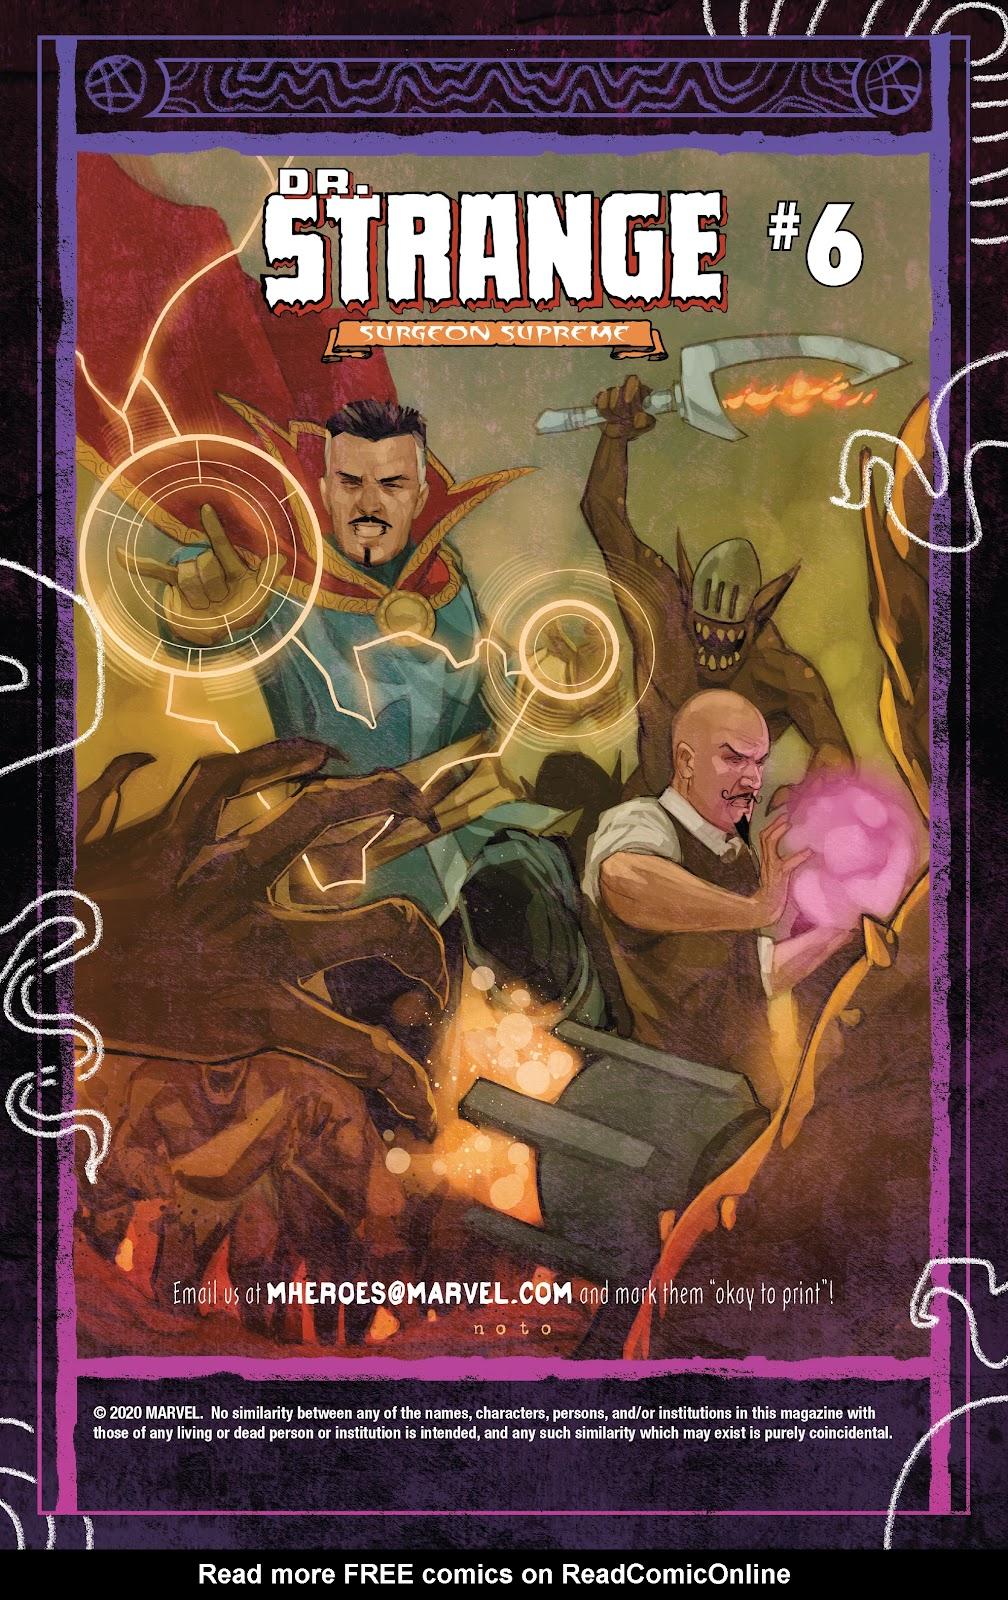 Read online Dr. Strange comic -  Issue #5 - 22